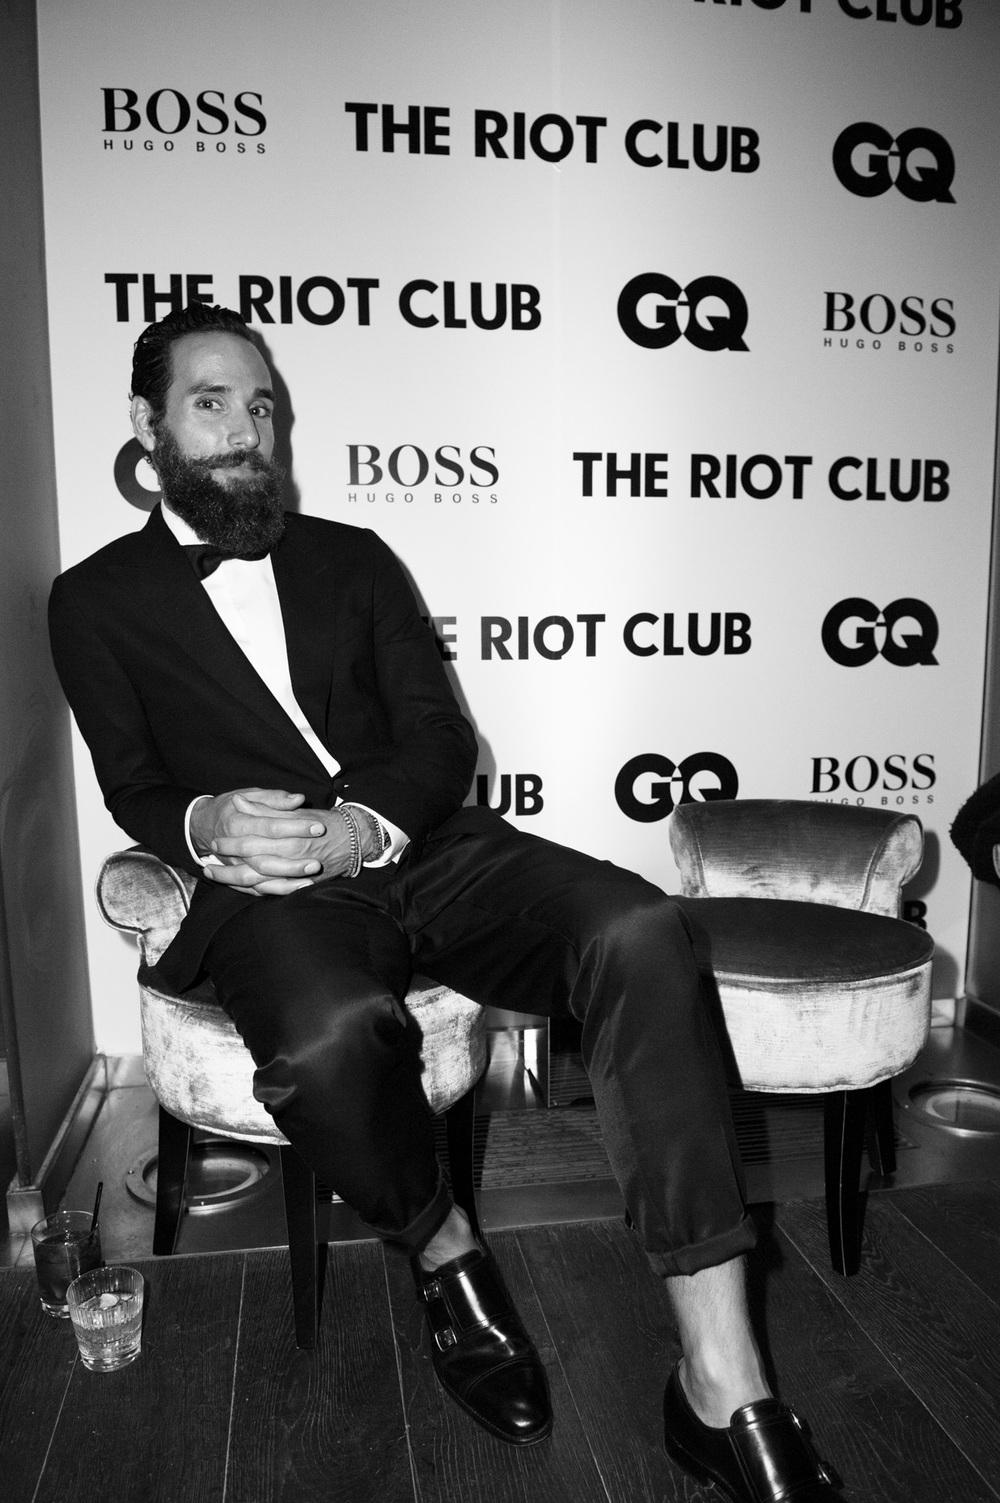 GQ x Hugo Boss event for 'Riot Club'